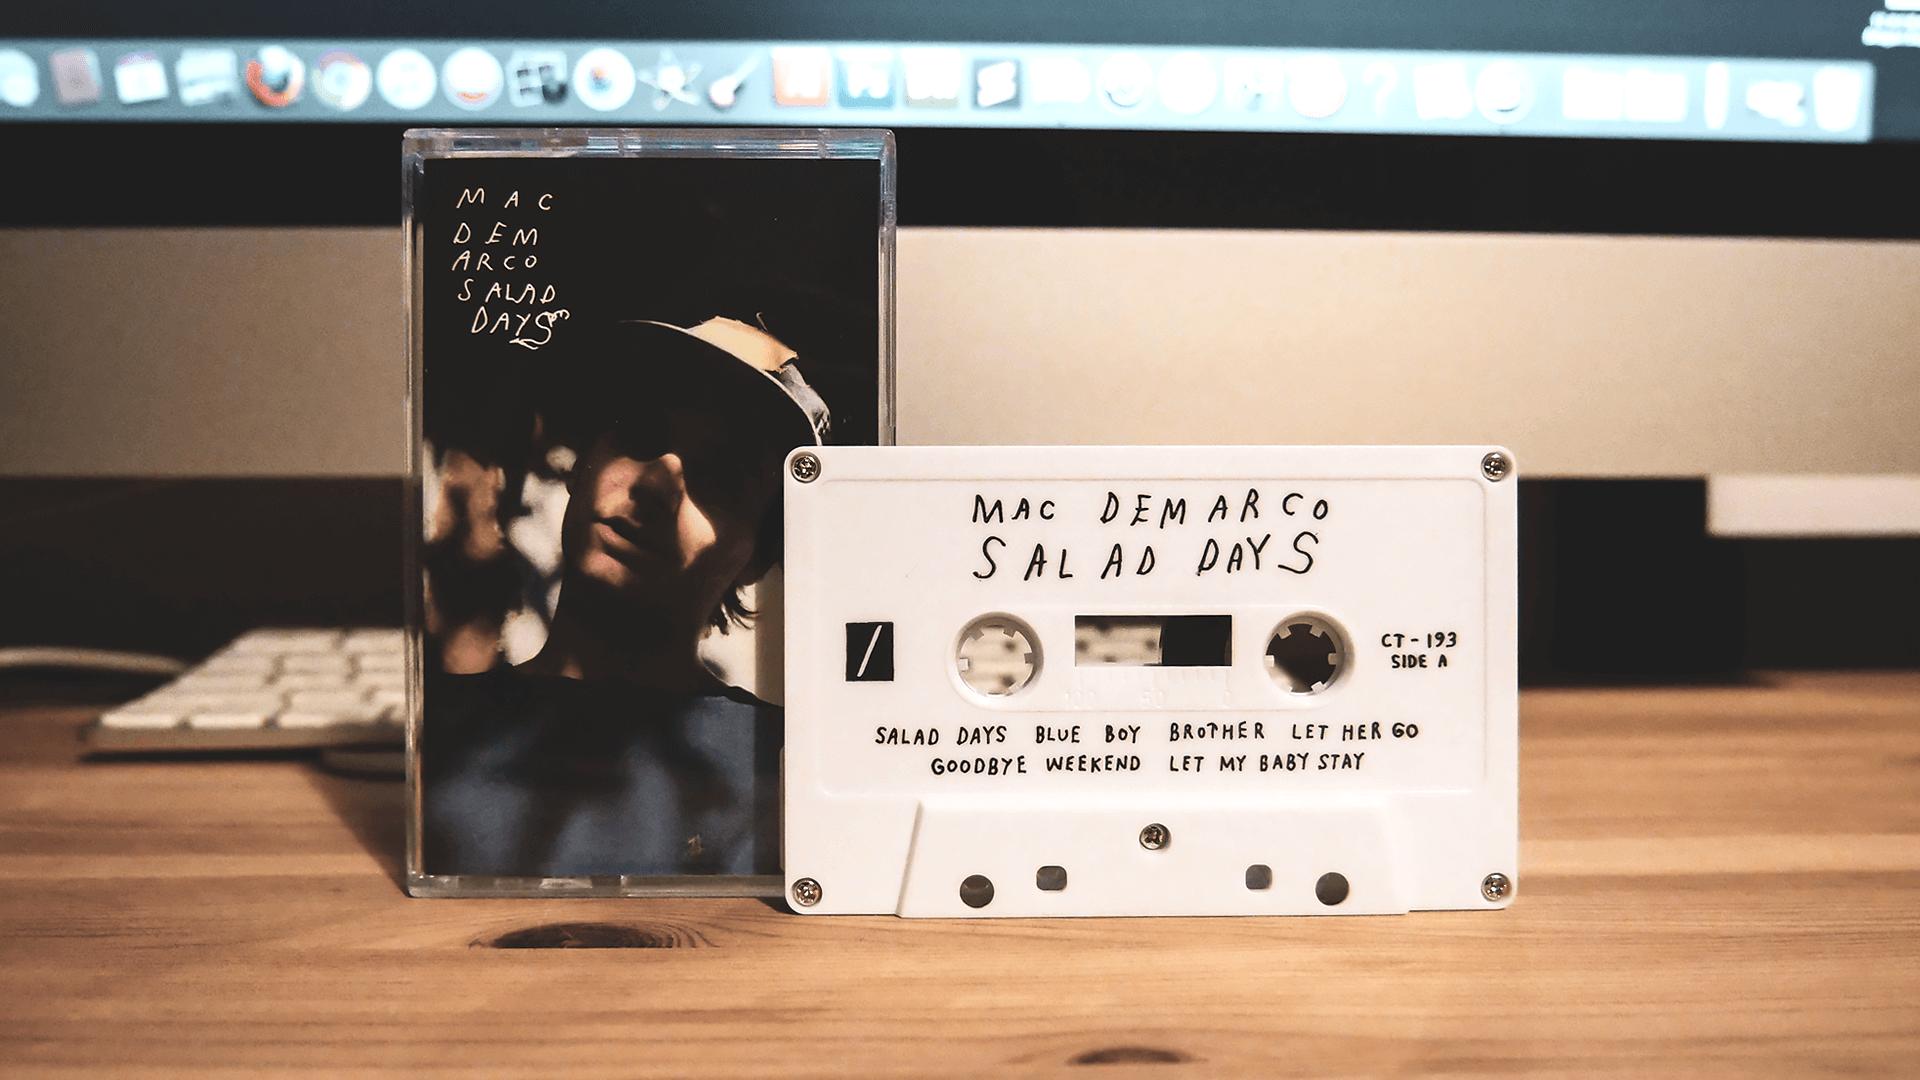 Mac DeMarcoの名盤「Salad Days」のカセットテープ